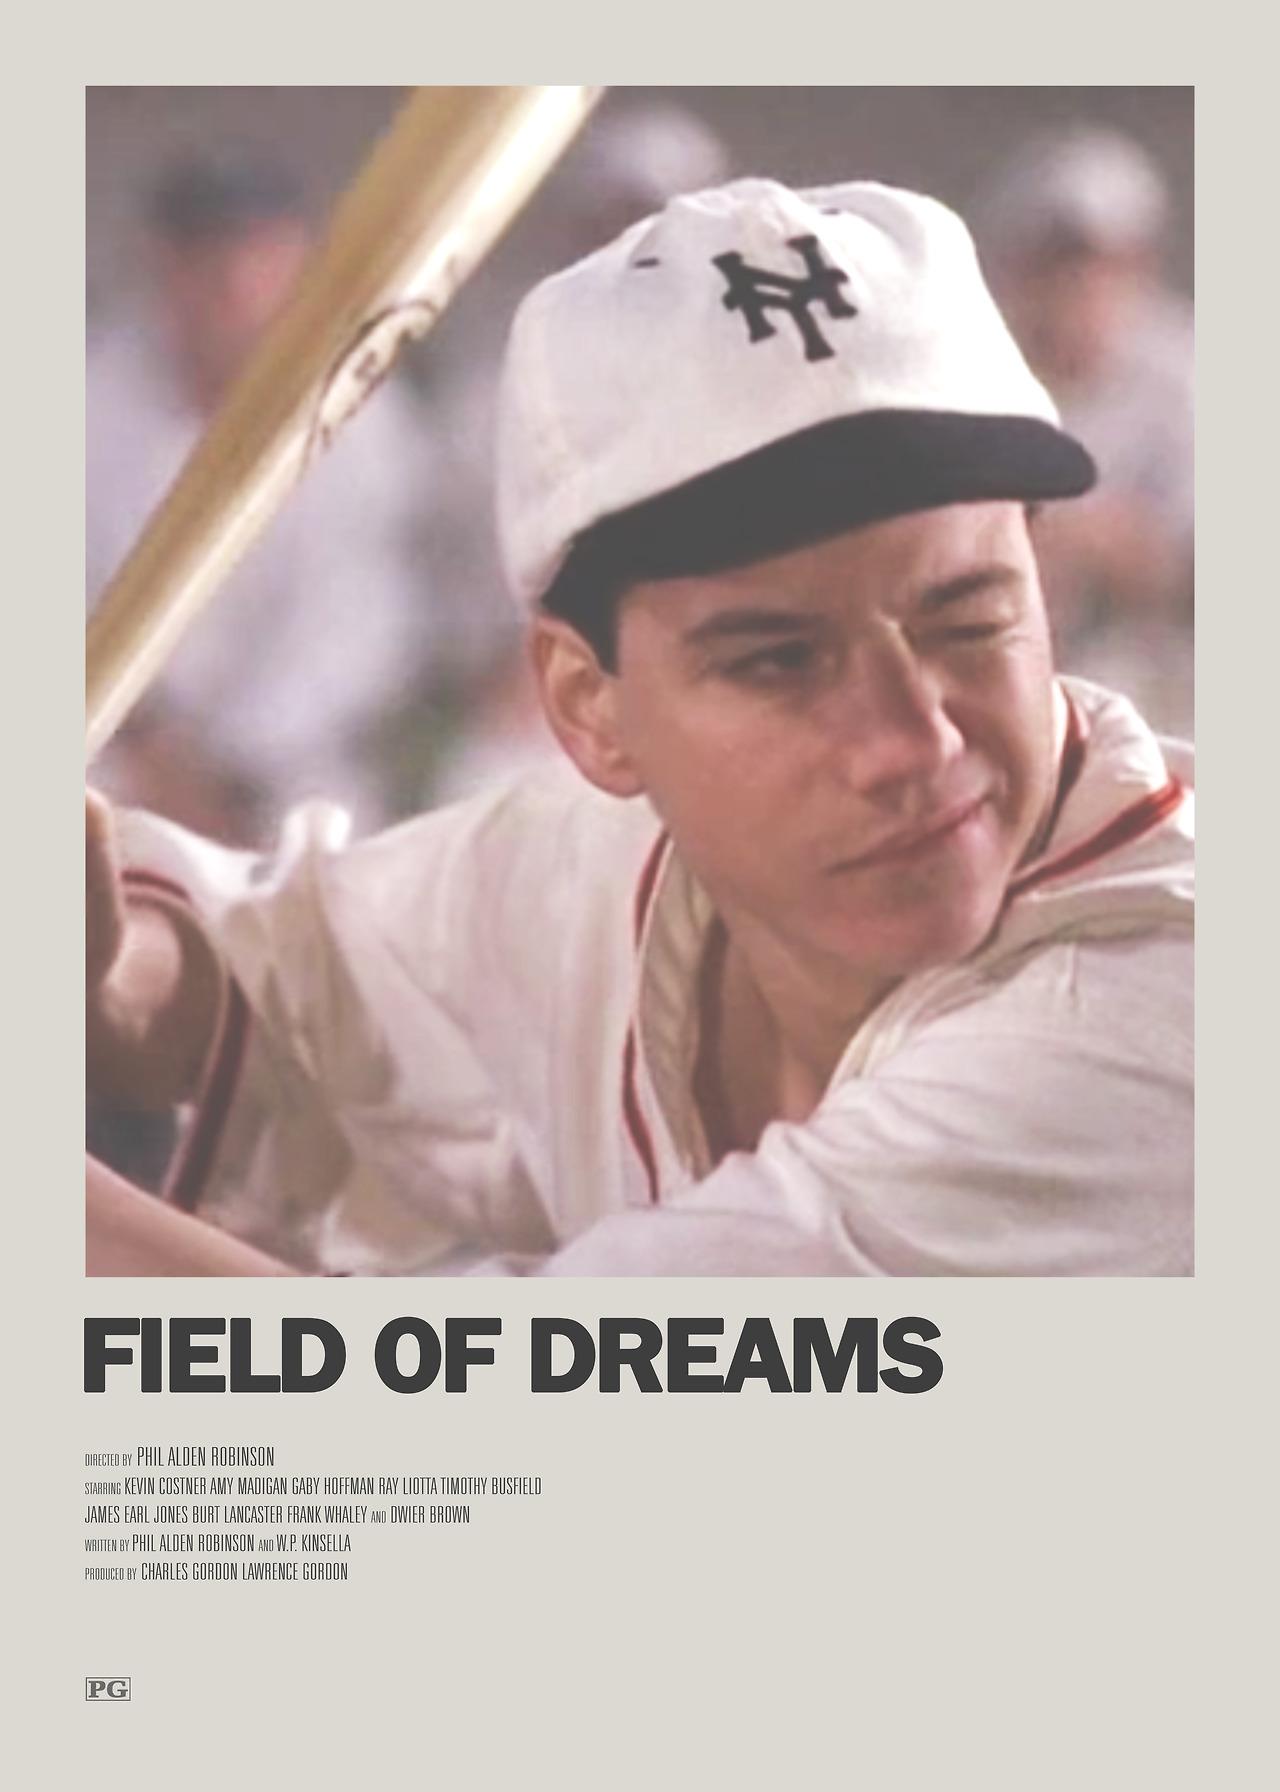 field of dreams minimal movie poster